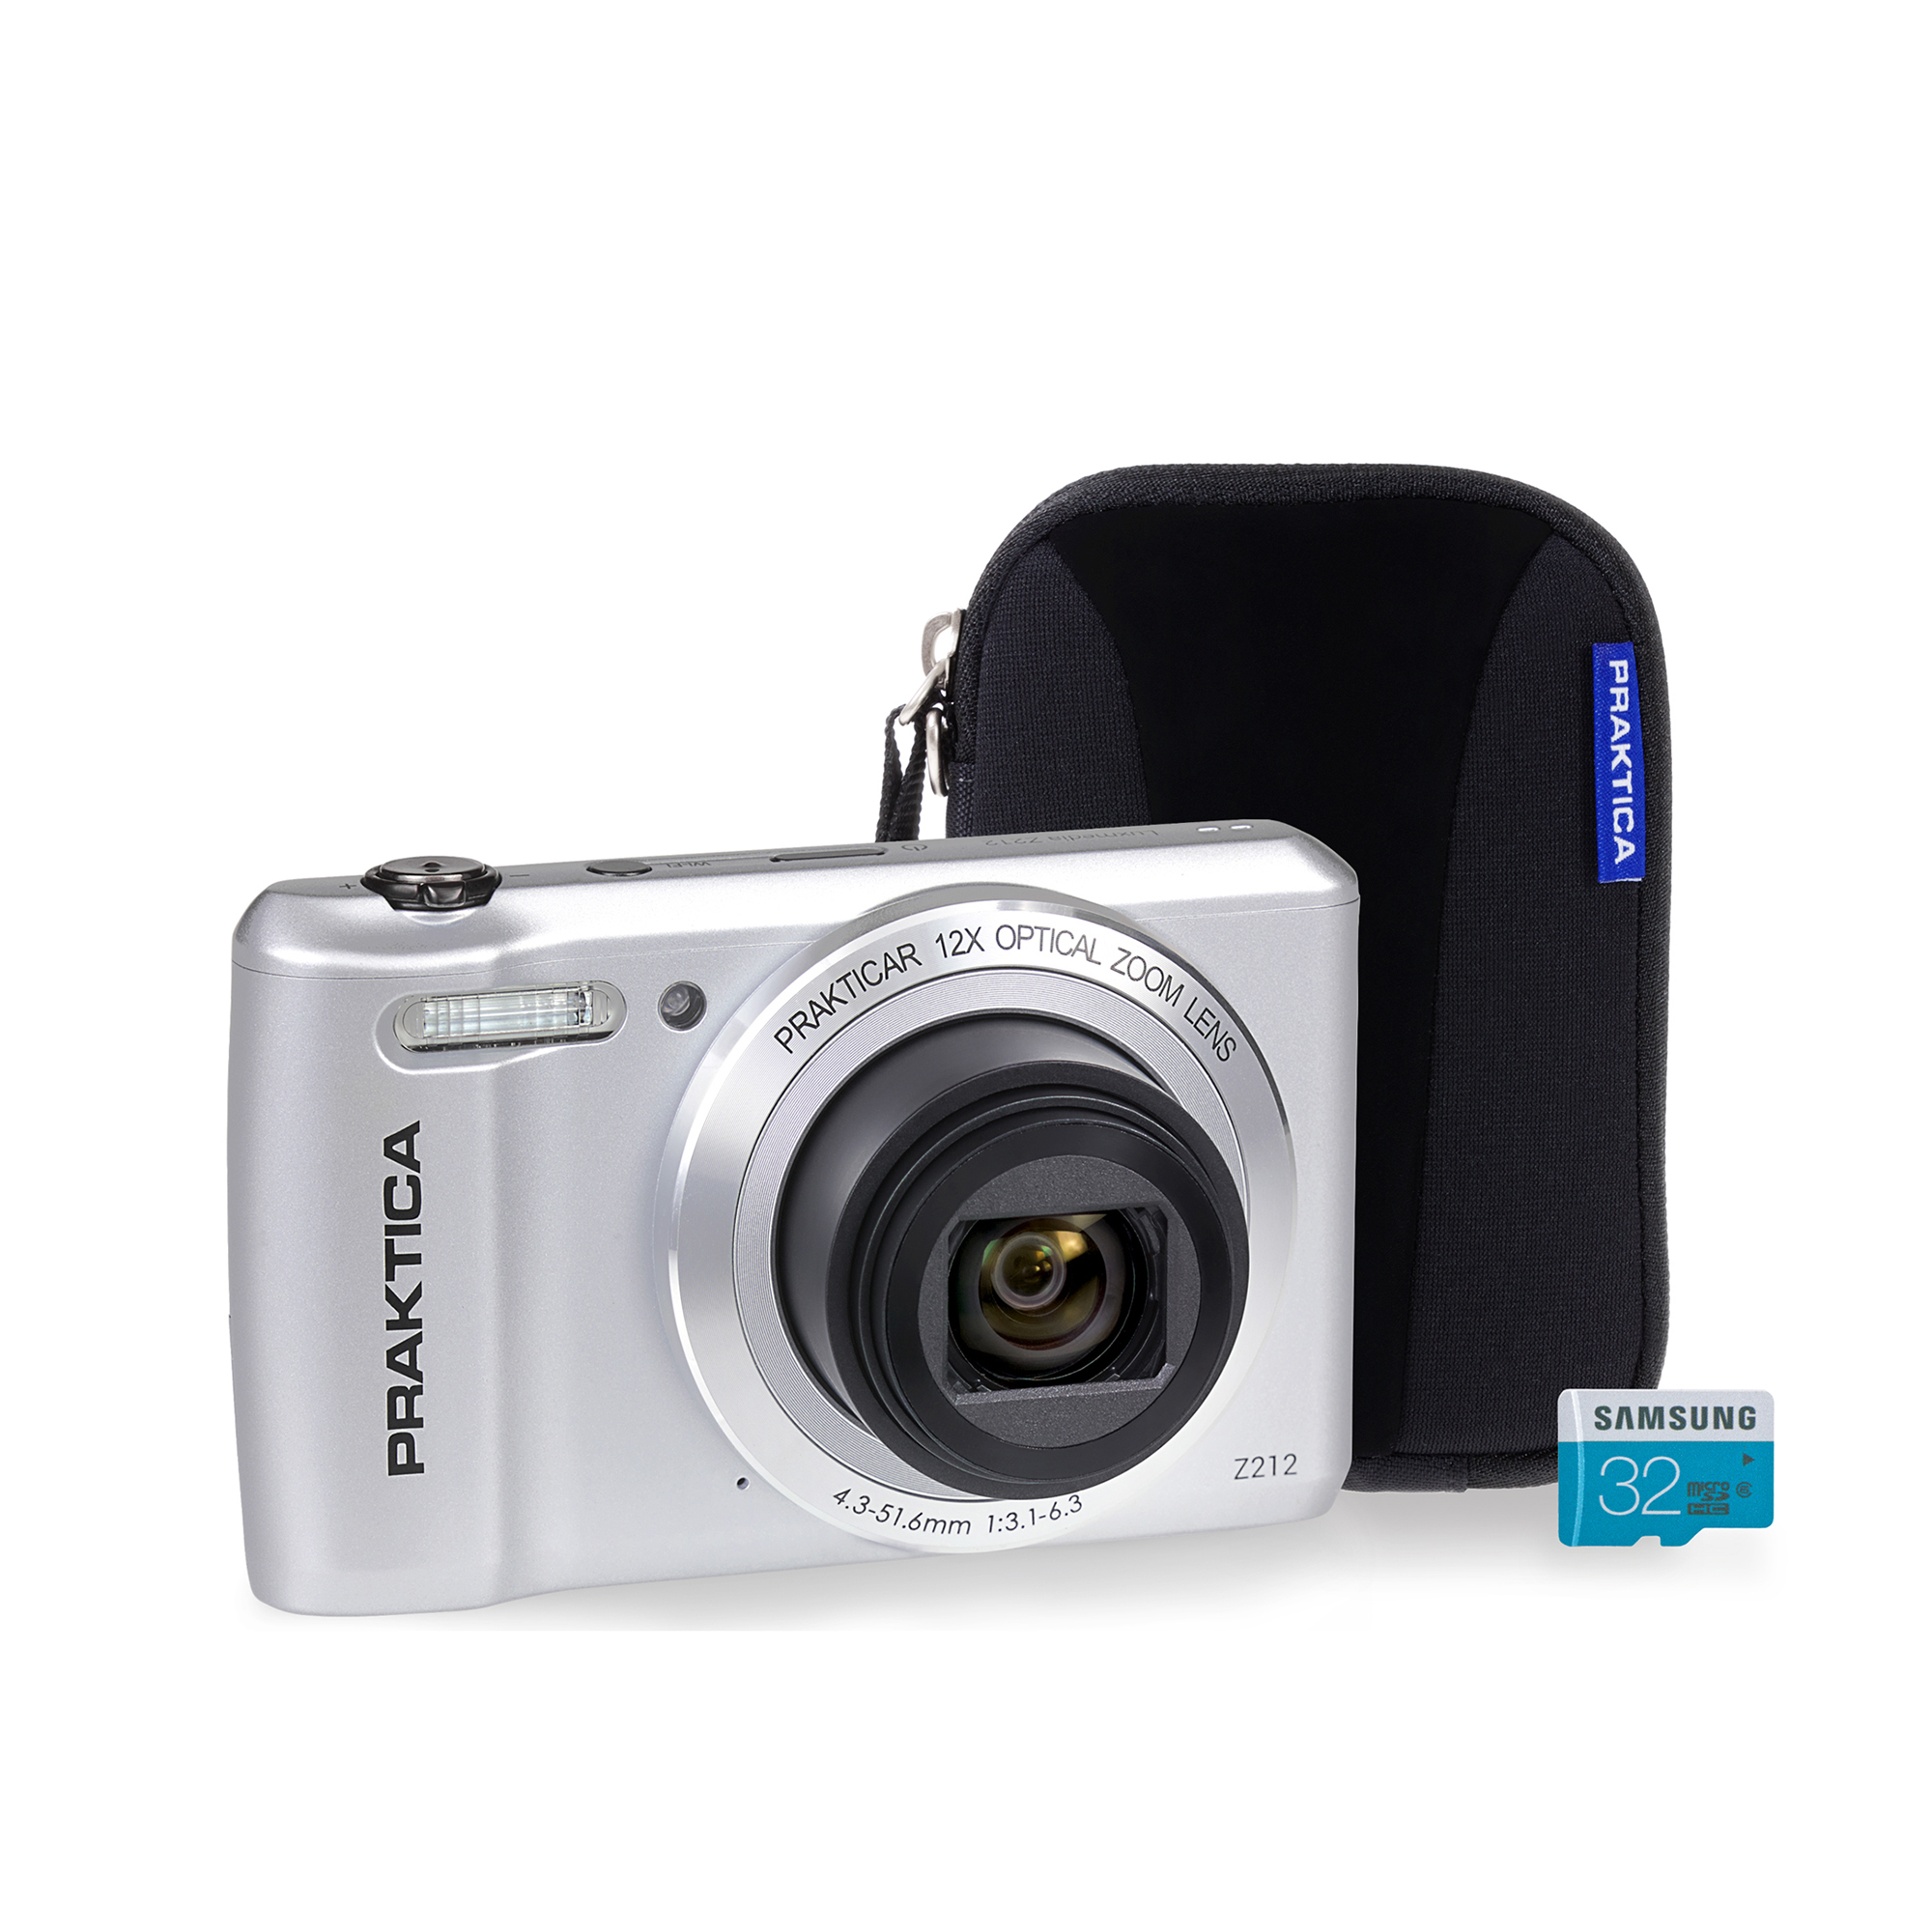 Praktica Z212 Digital Camera Kit 12x Optical Zoom Case & 32GB Micro SD Card Silver Ref PRA242